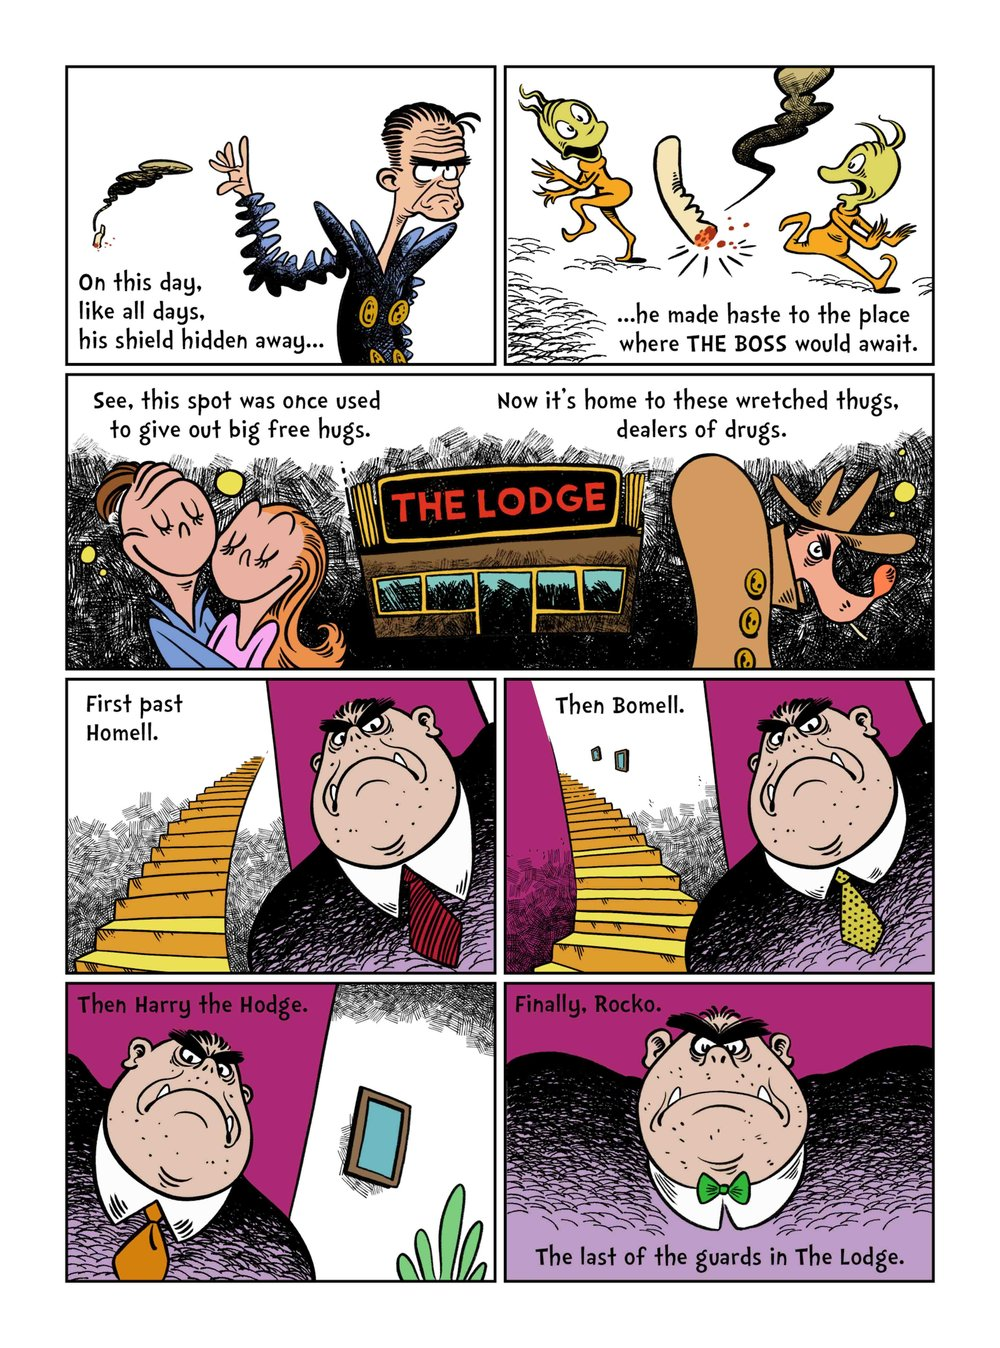 Image Fap Comics Ideal no dawn for a pawn (dr. seuss meets sin city) — james e. roche